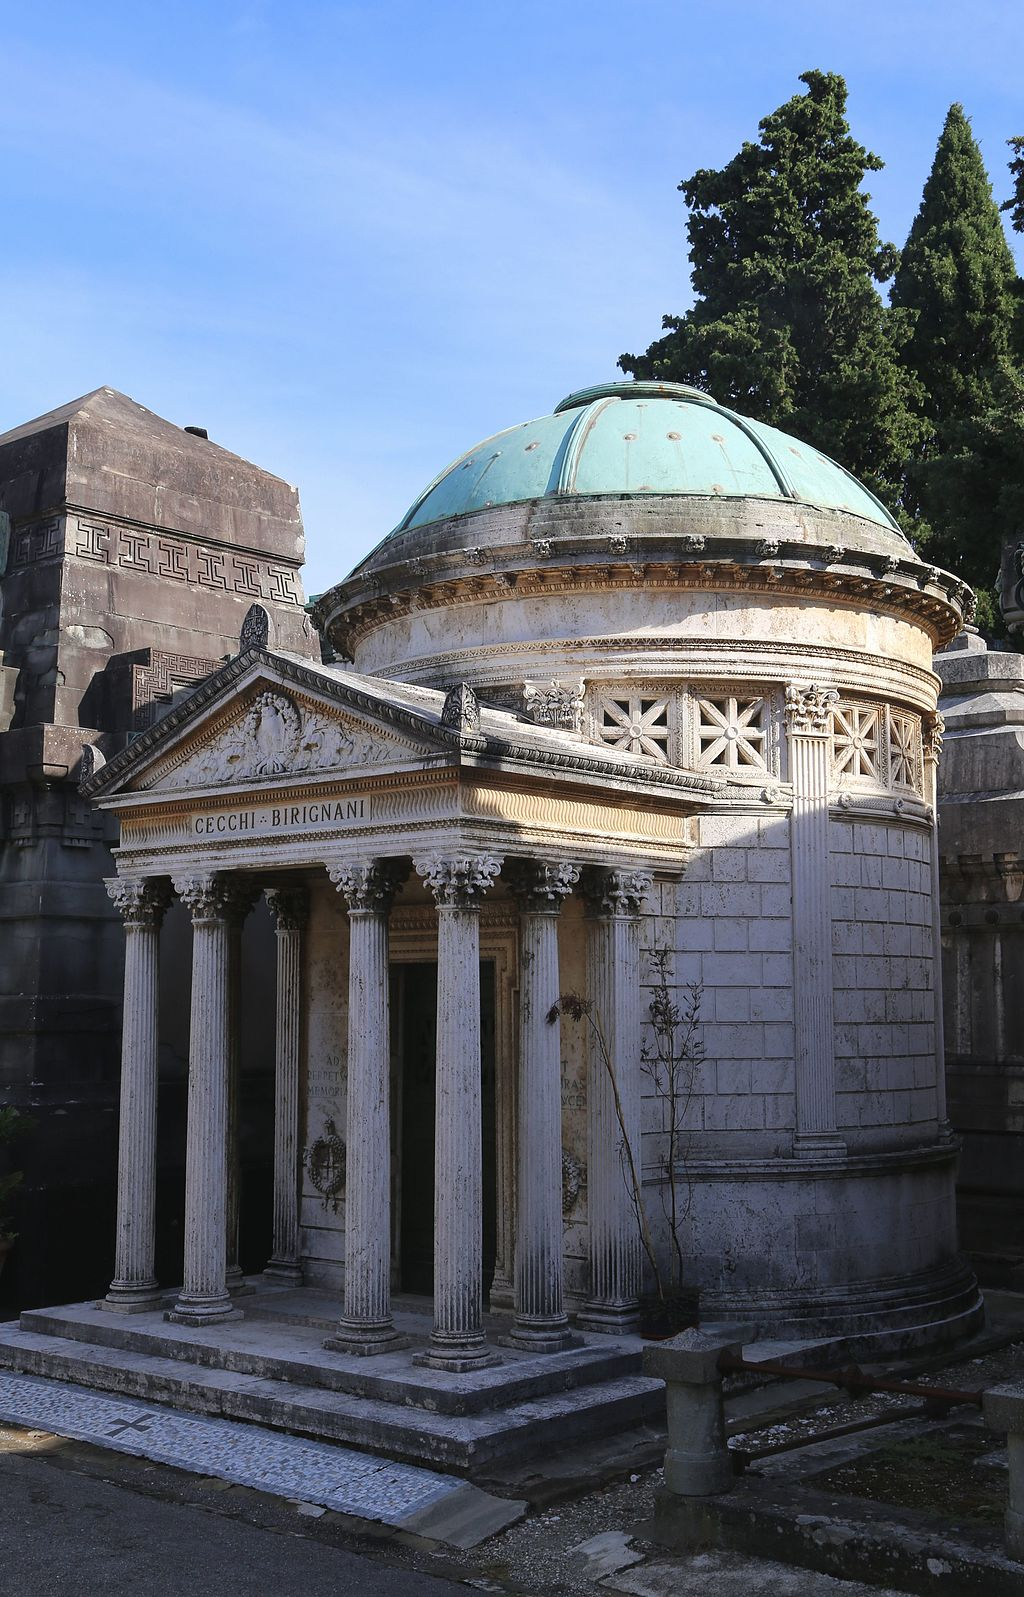 San Miniato al Monte, Cimitero delle Porte Sante